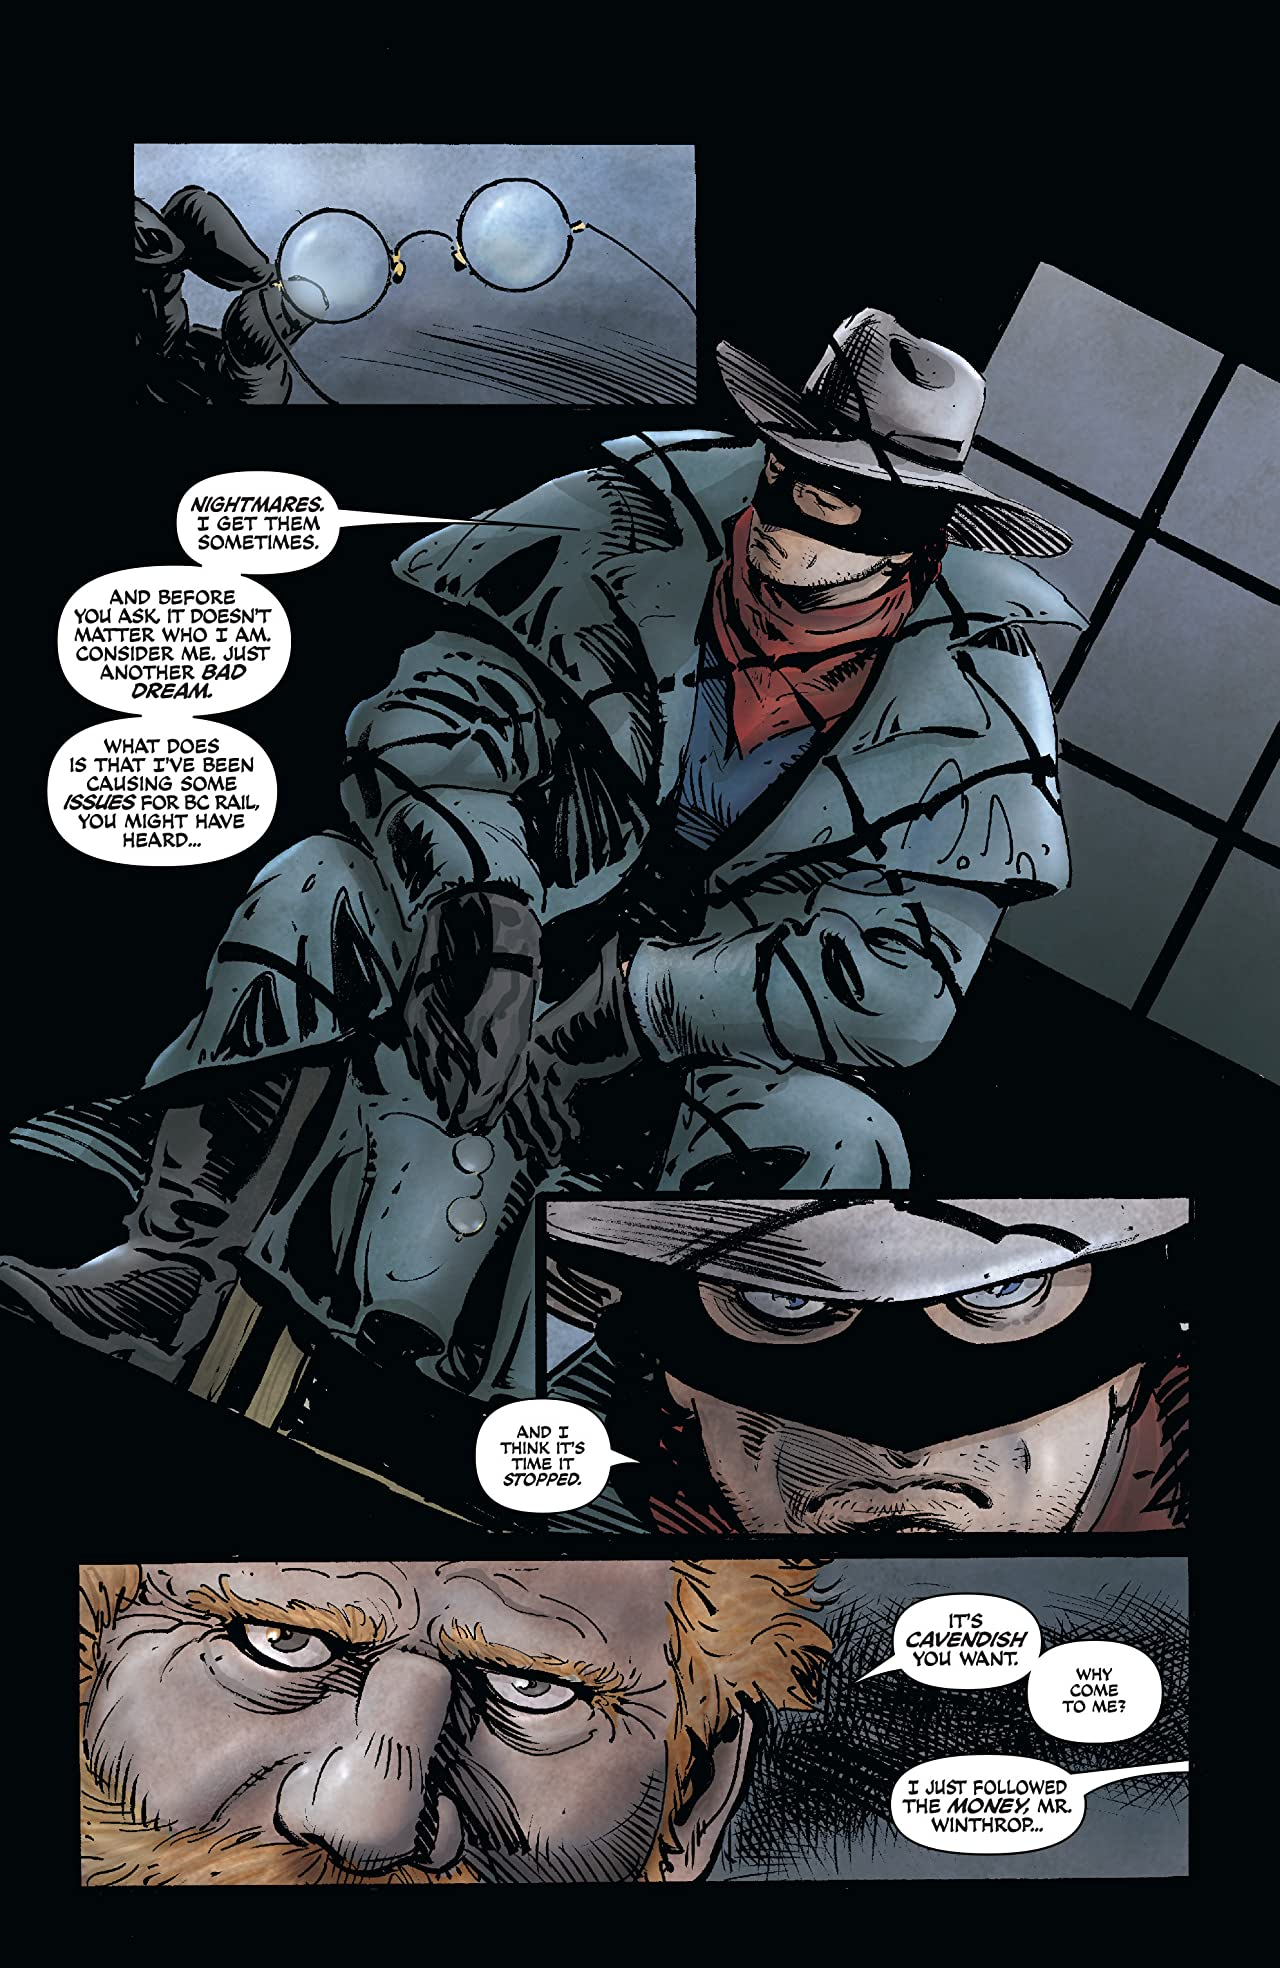 The Lone Ranger Vol. 1 #12